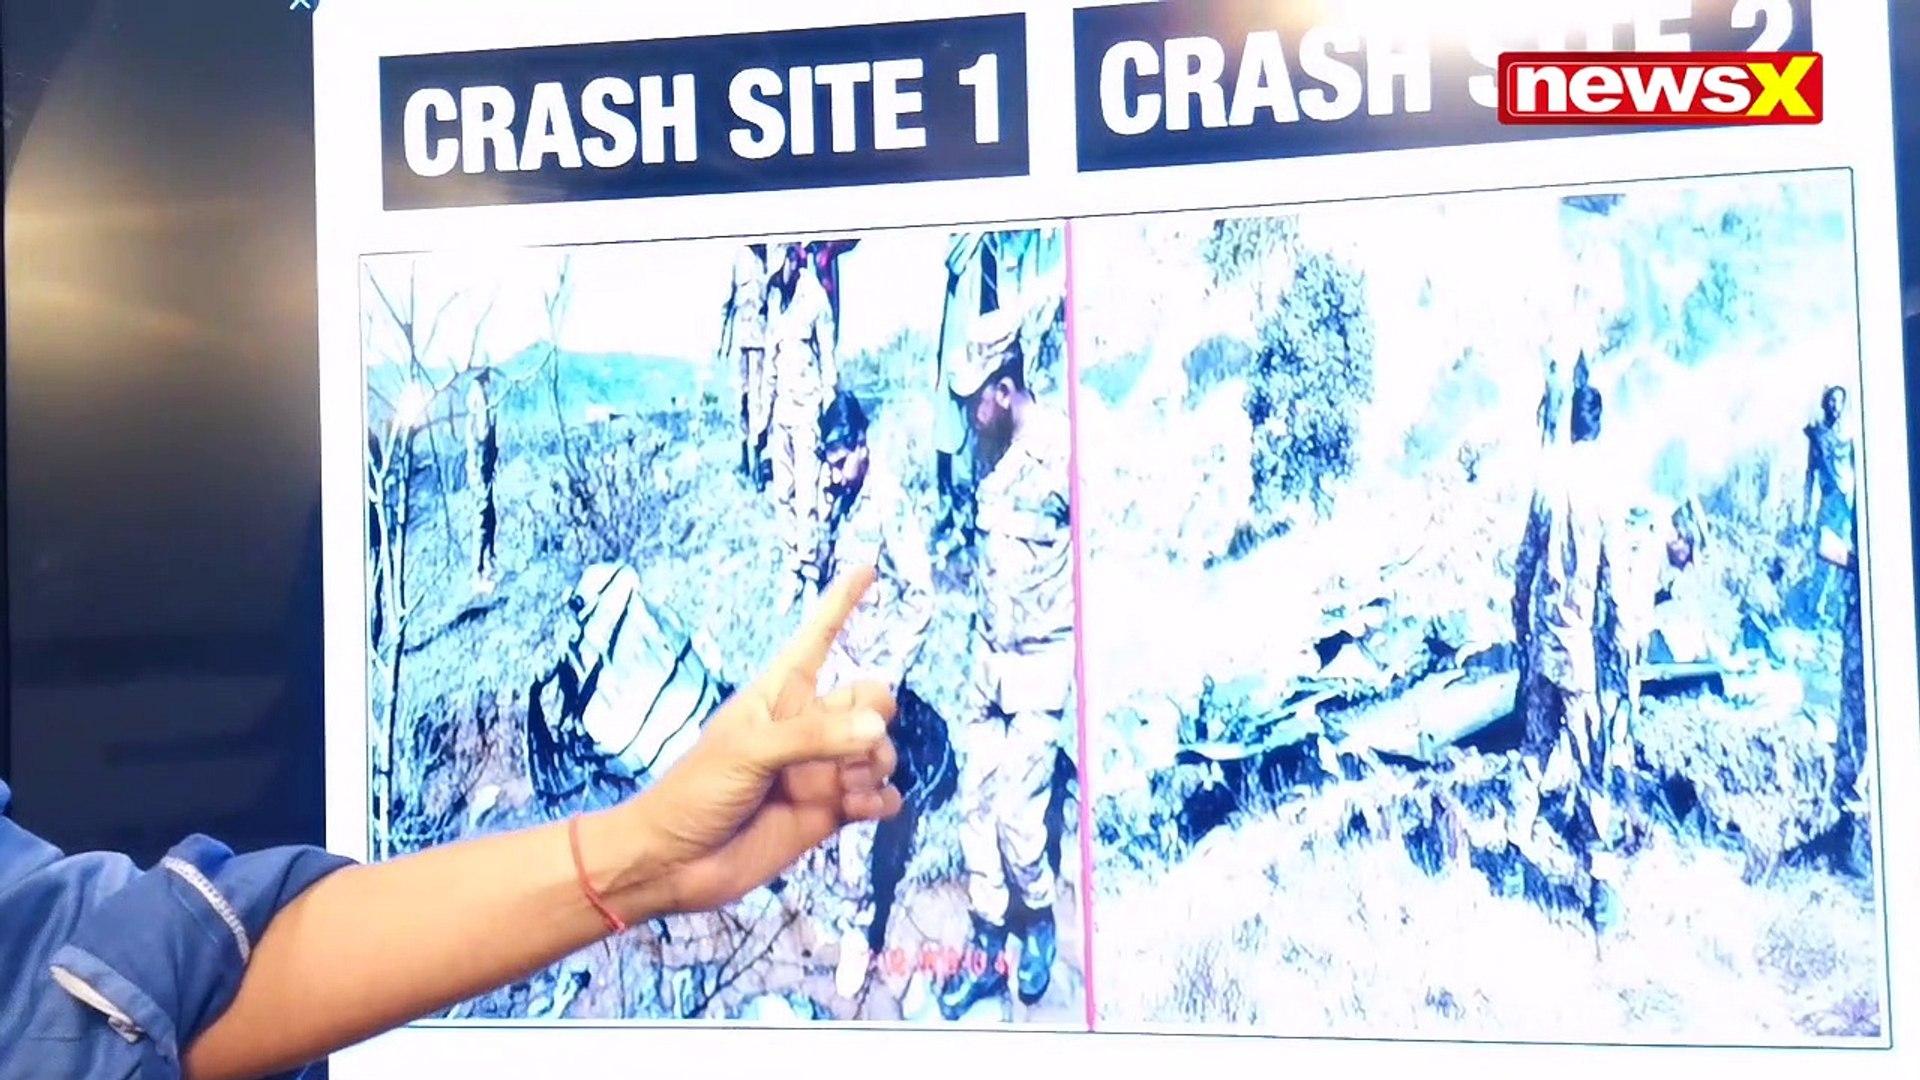 NewsX Explained: IAF Confirms Abhinandan Varthaman Shot Down Pakistan F-16 Fighter Jet, Facts Check